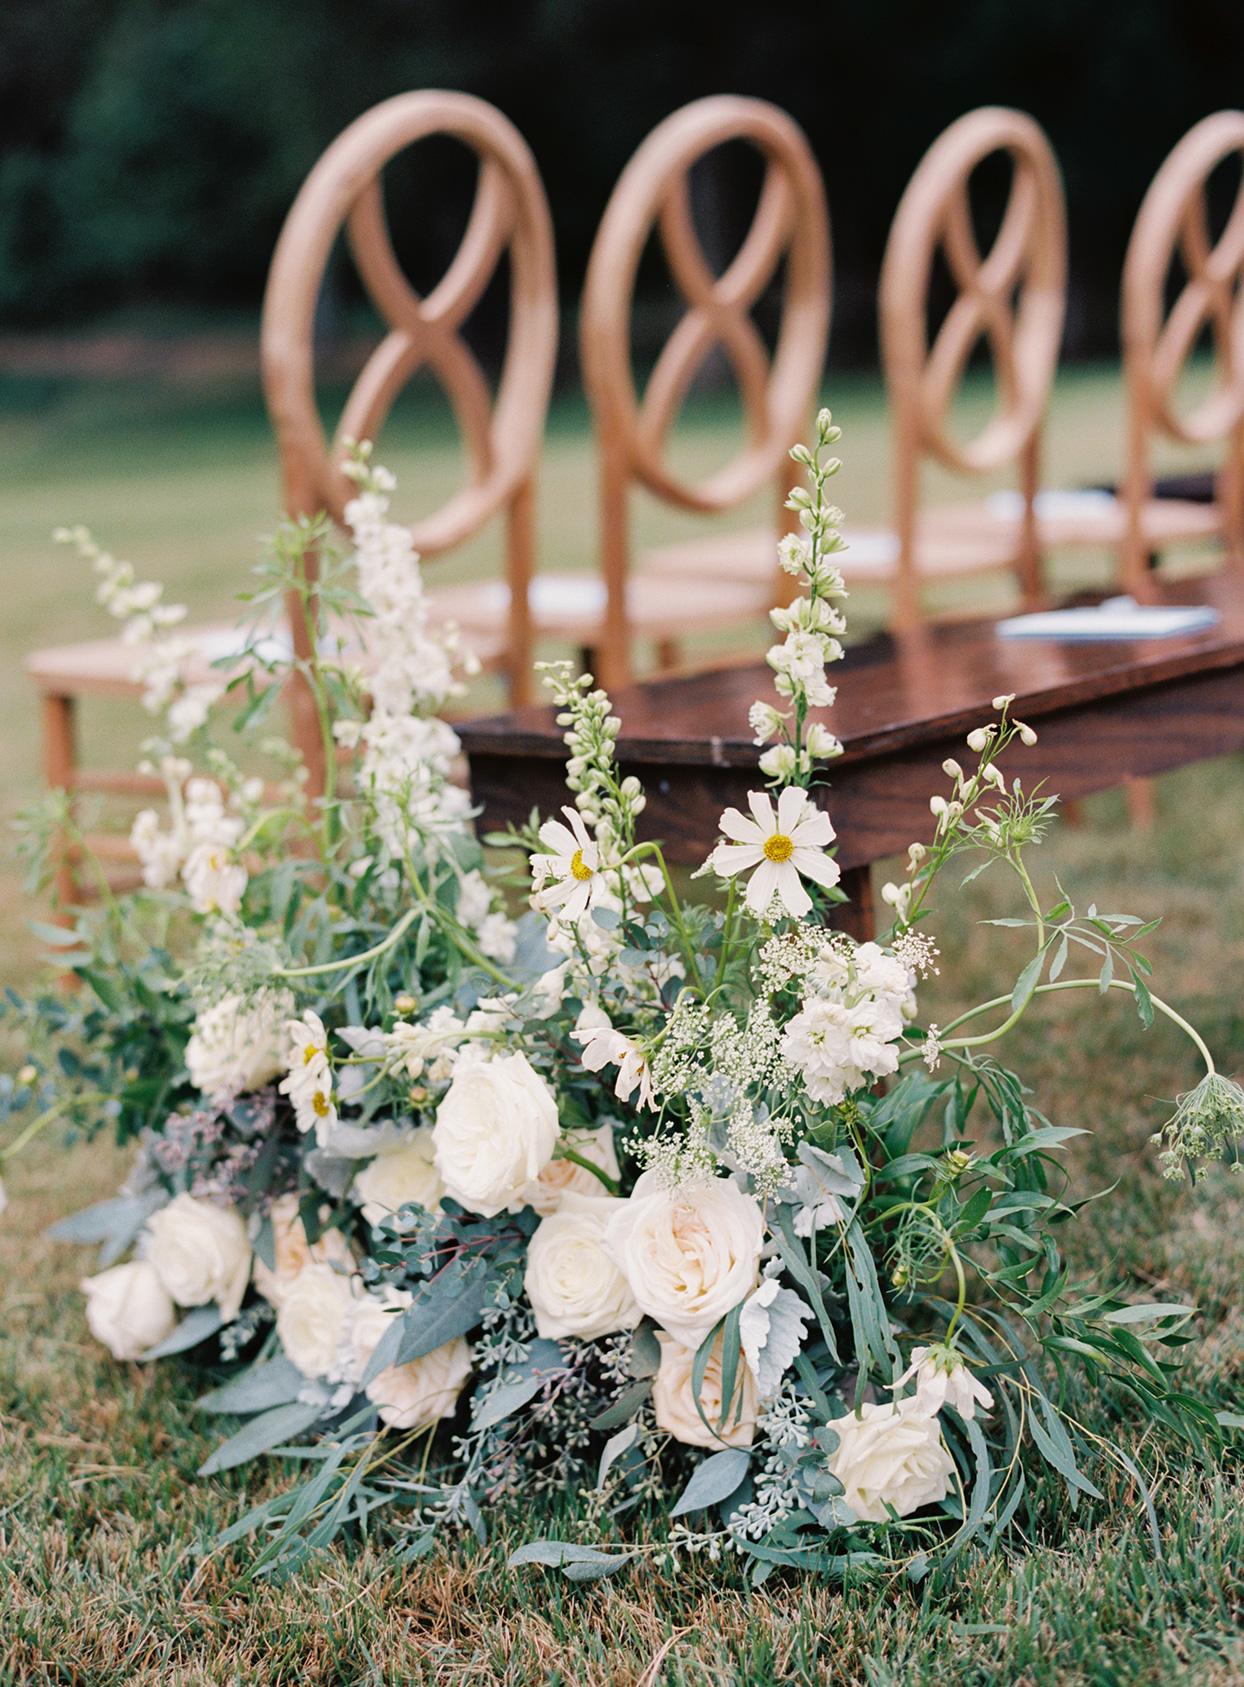 lauren chris wedding ceremony white flowers in the grass lining aisle